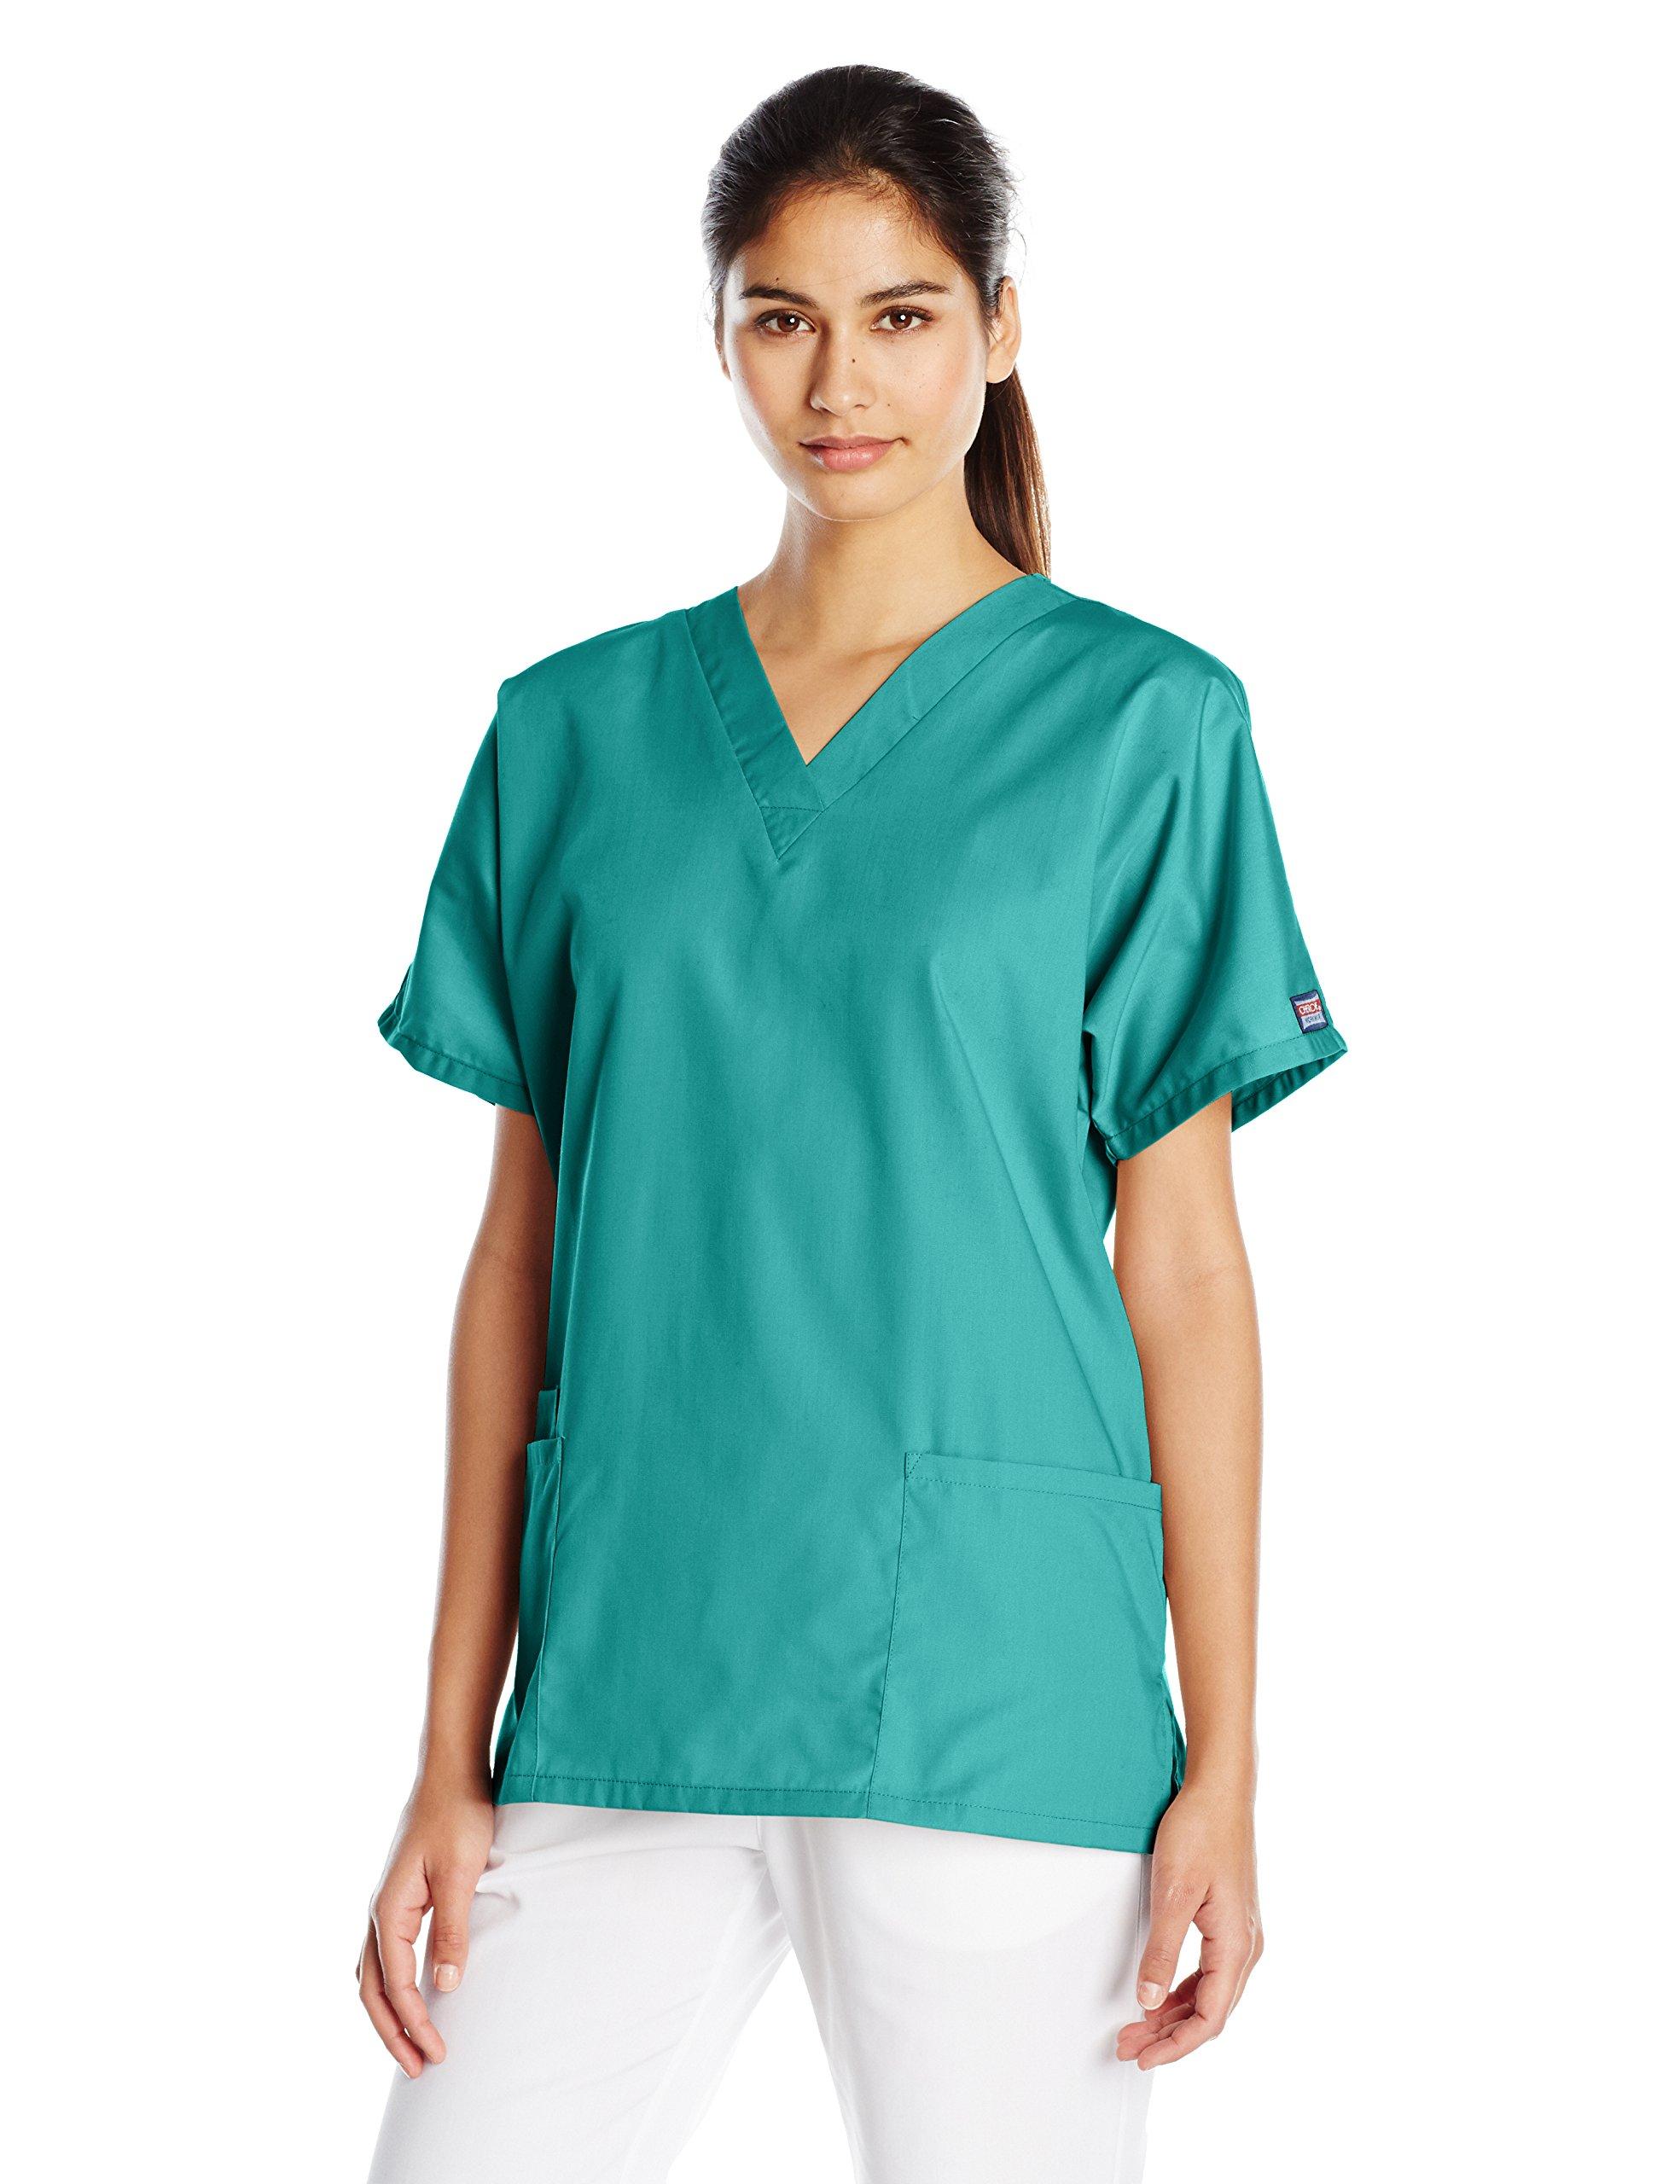 Cherokee Women's V Neck Scrubs Shirt, Surgical Green, Medium by Cherokee